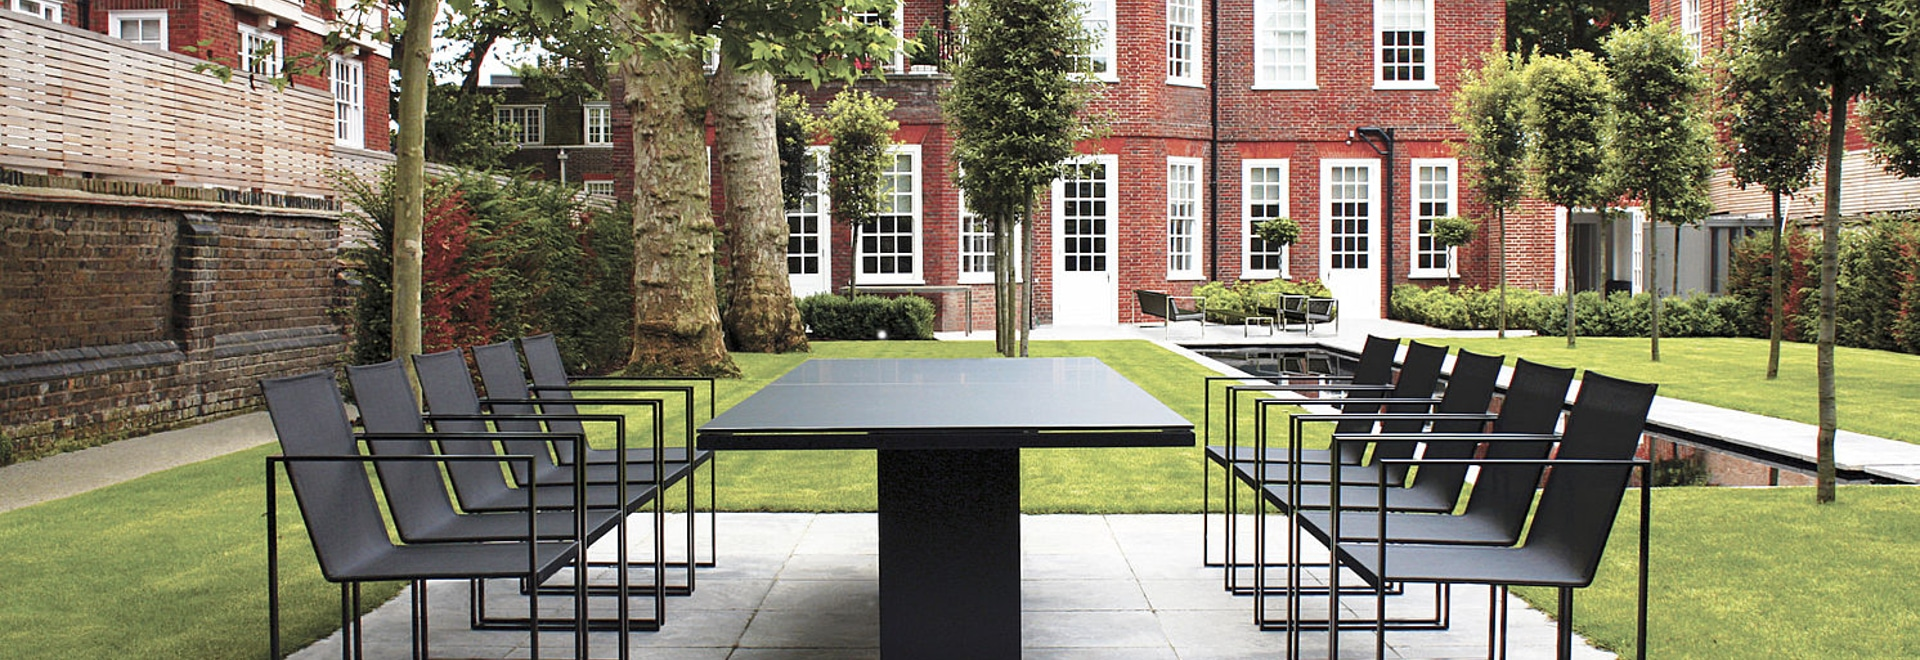 Neues Design: Die exklusive Gartenmöbel-Linie FueraDentro - FueraDentro